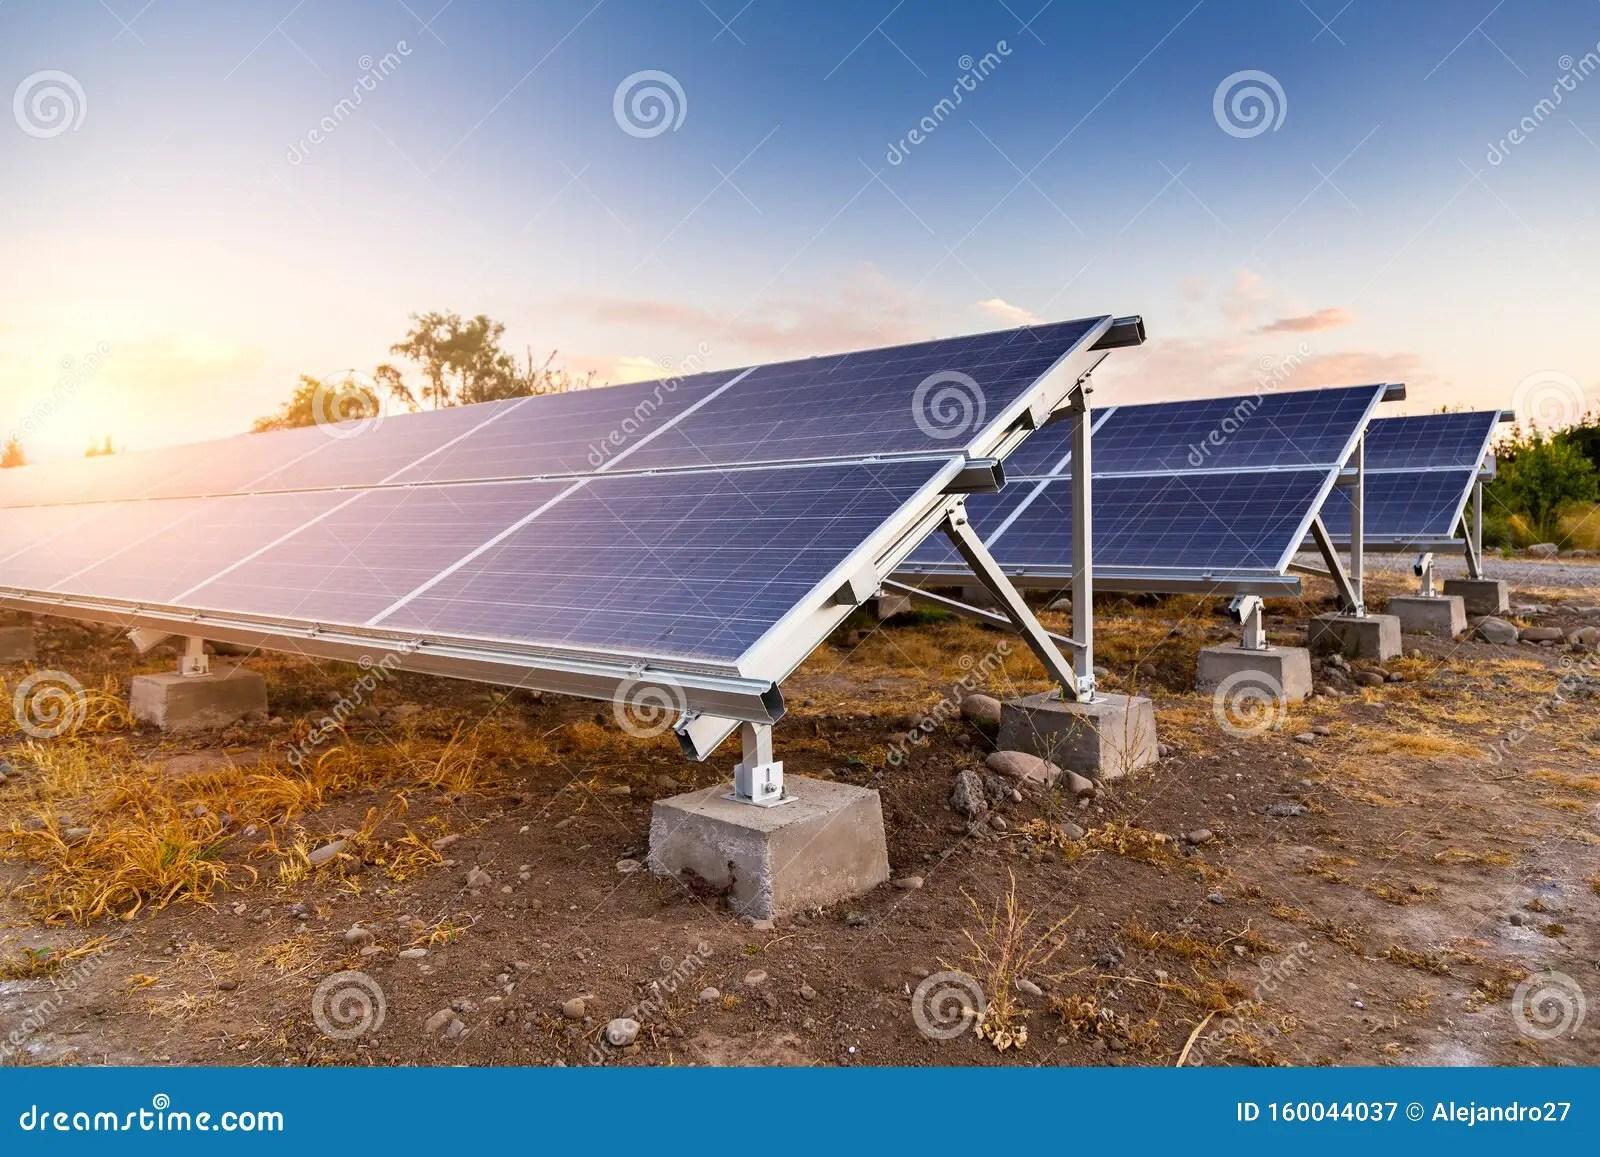 Solar Panels Alternative Energy Source Photovoltaic